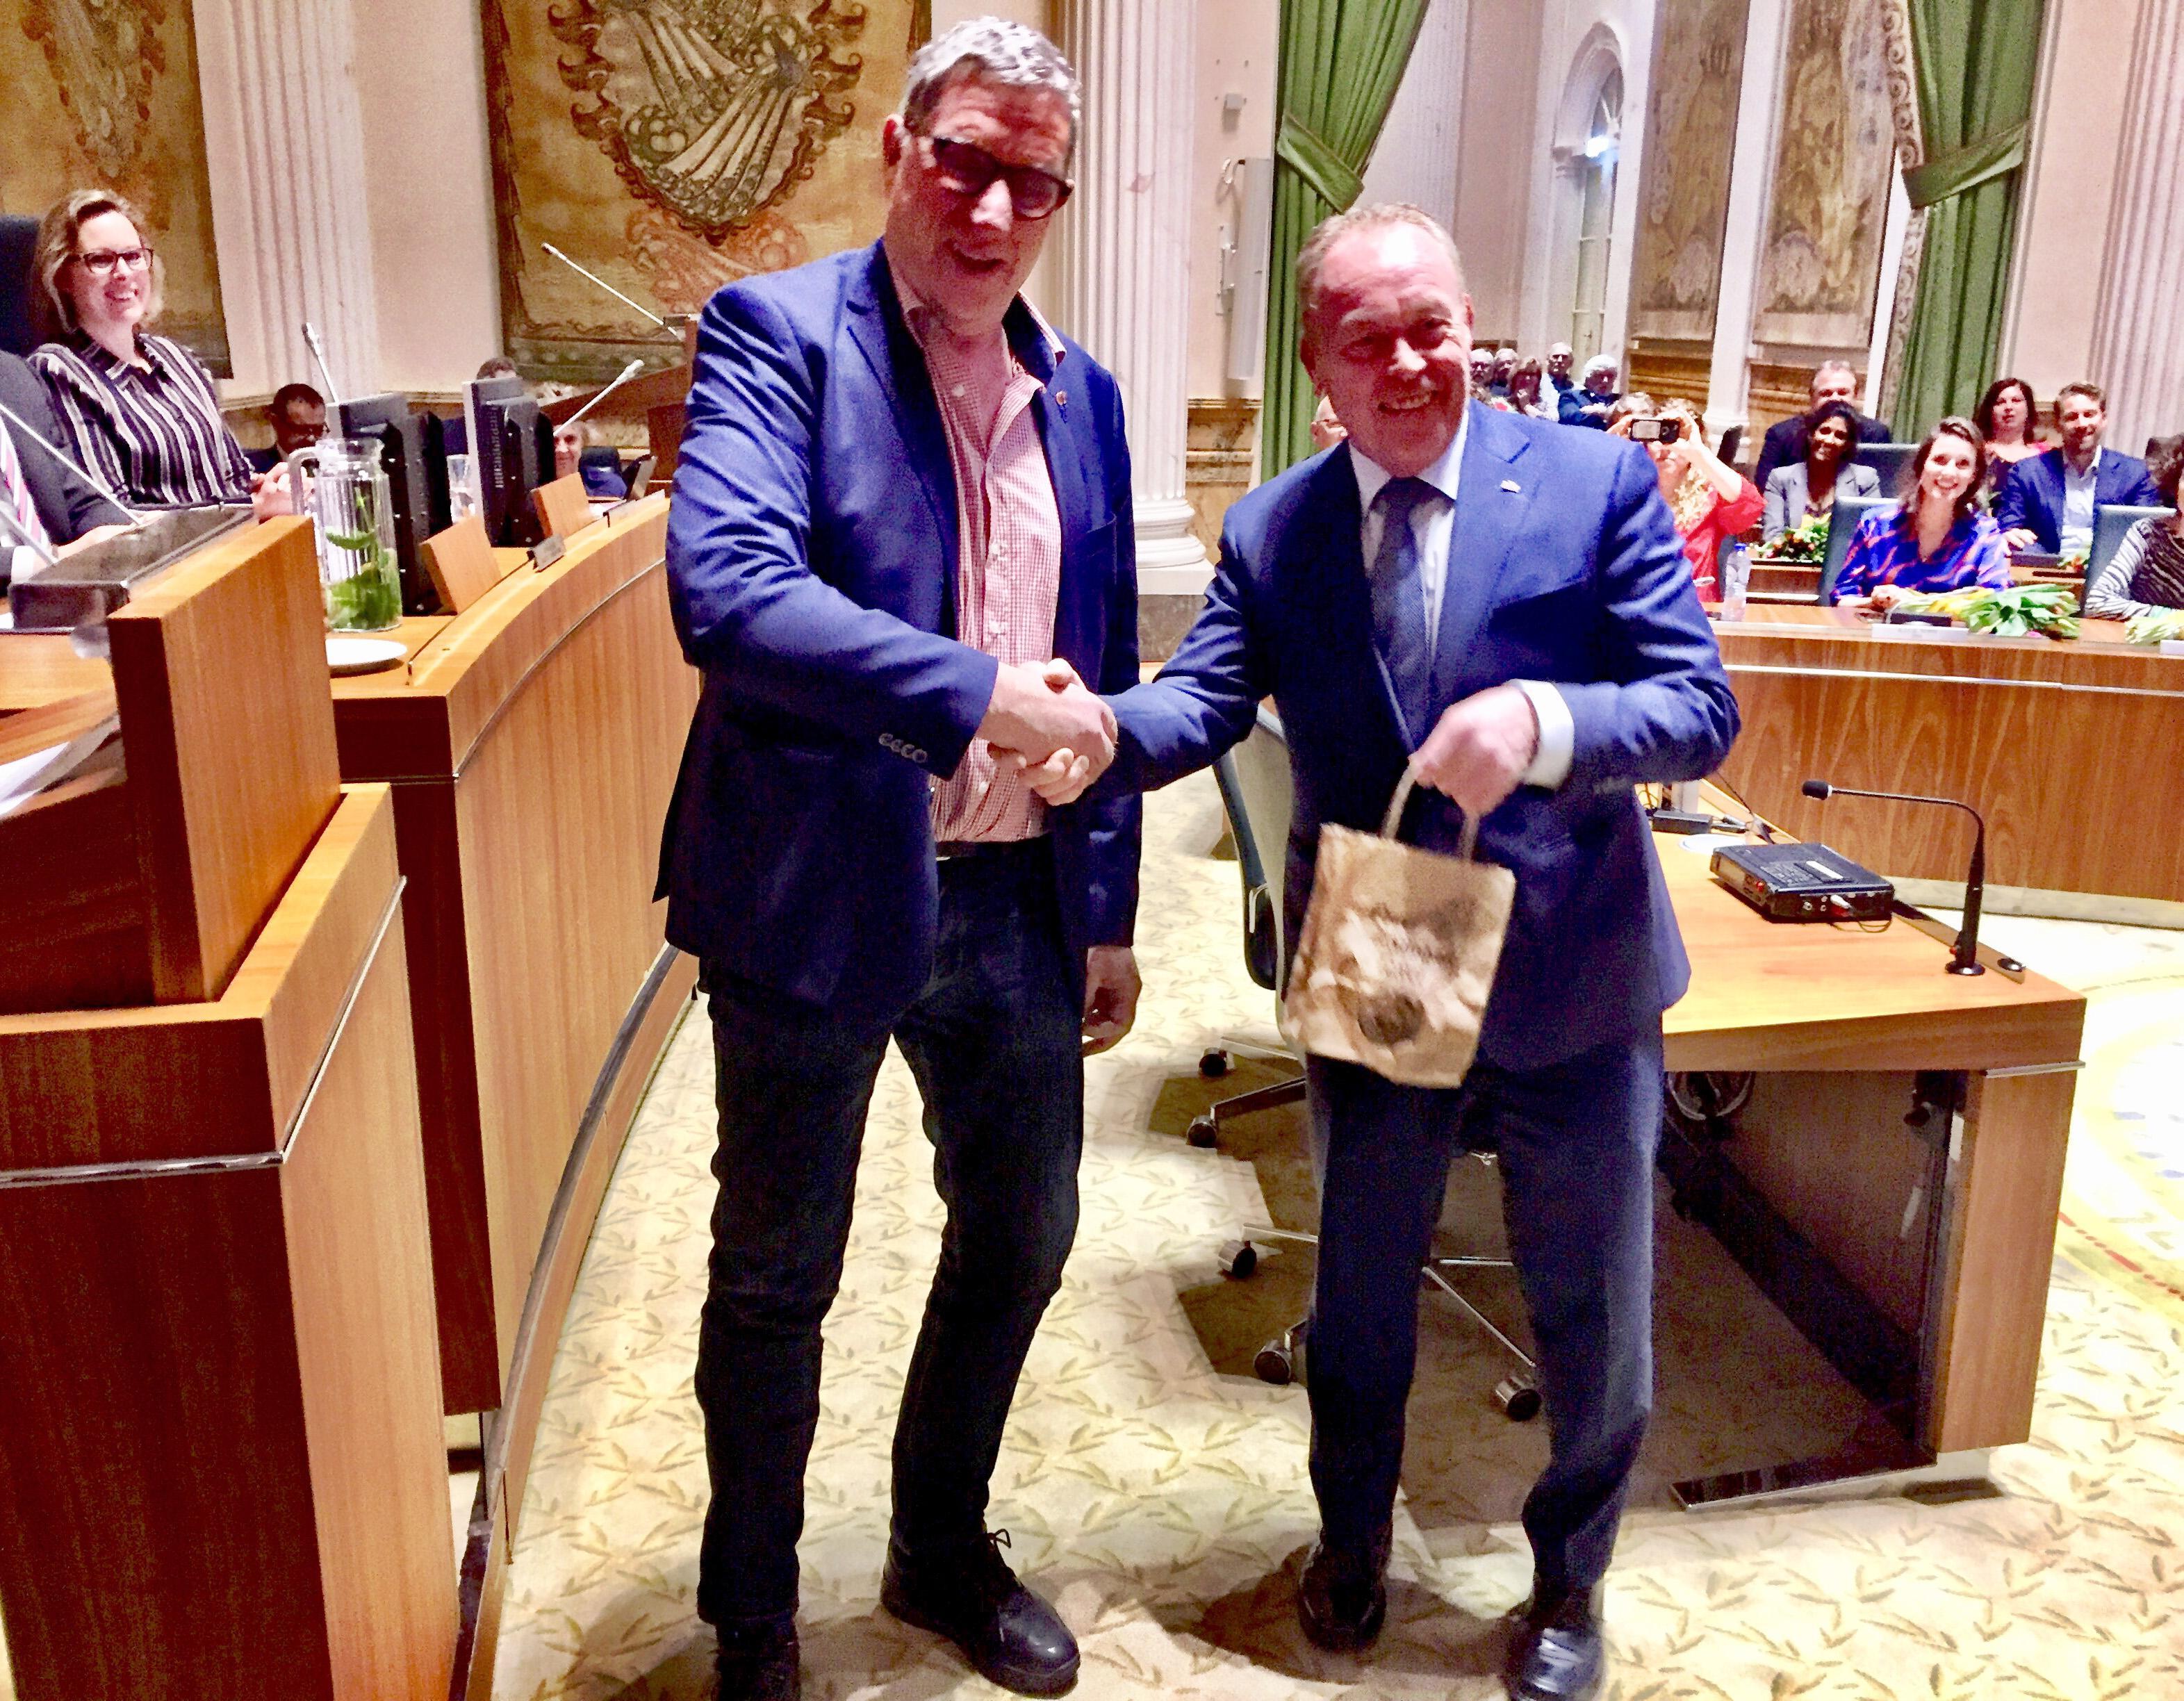 Noord-Holland krijgt er in één avond 37 'ambassadeurs' bij: Statenleden nemen afscheid